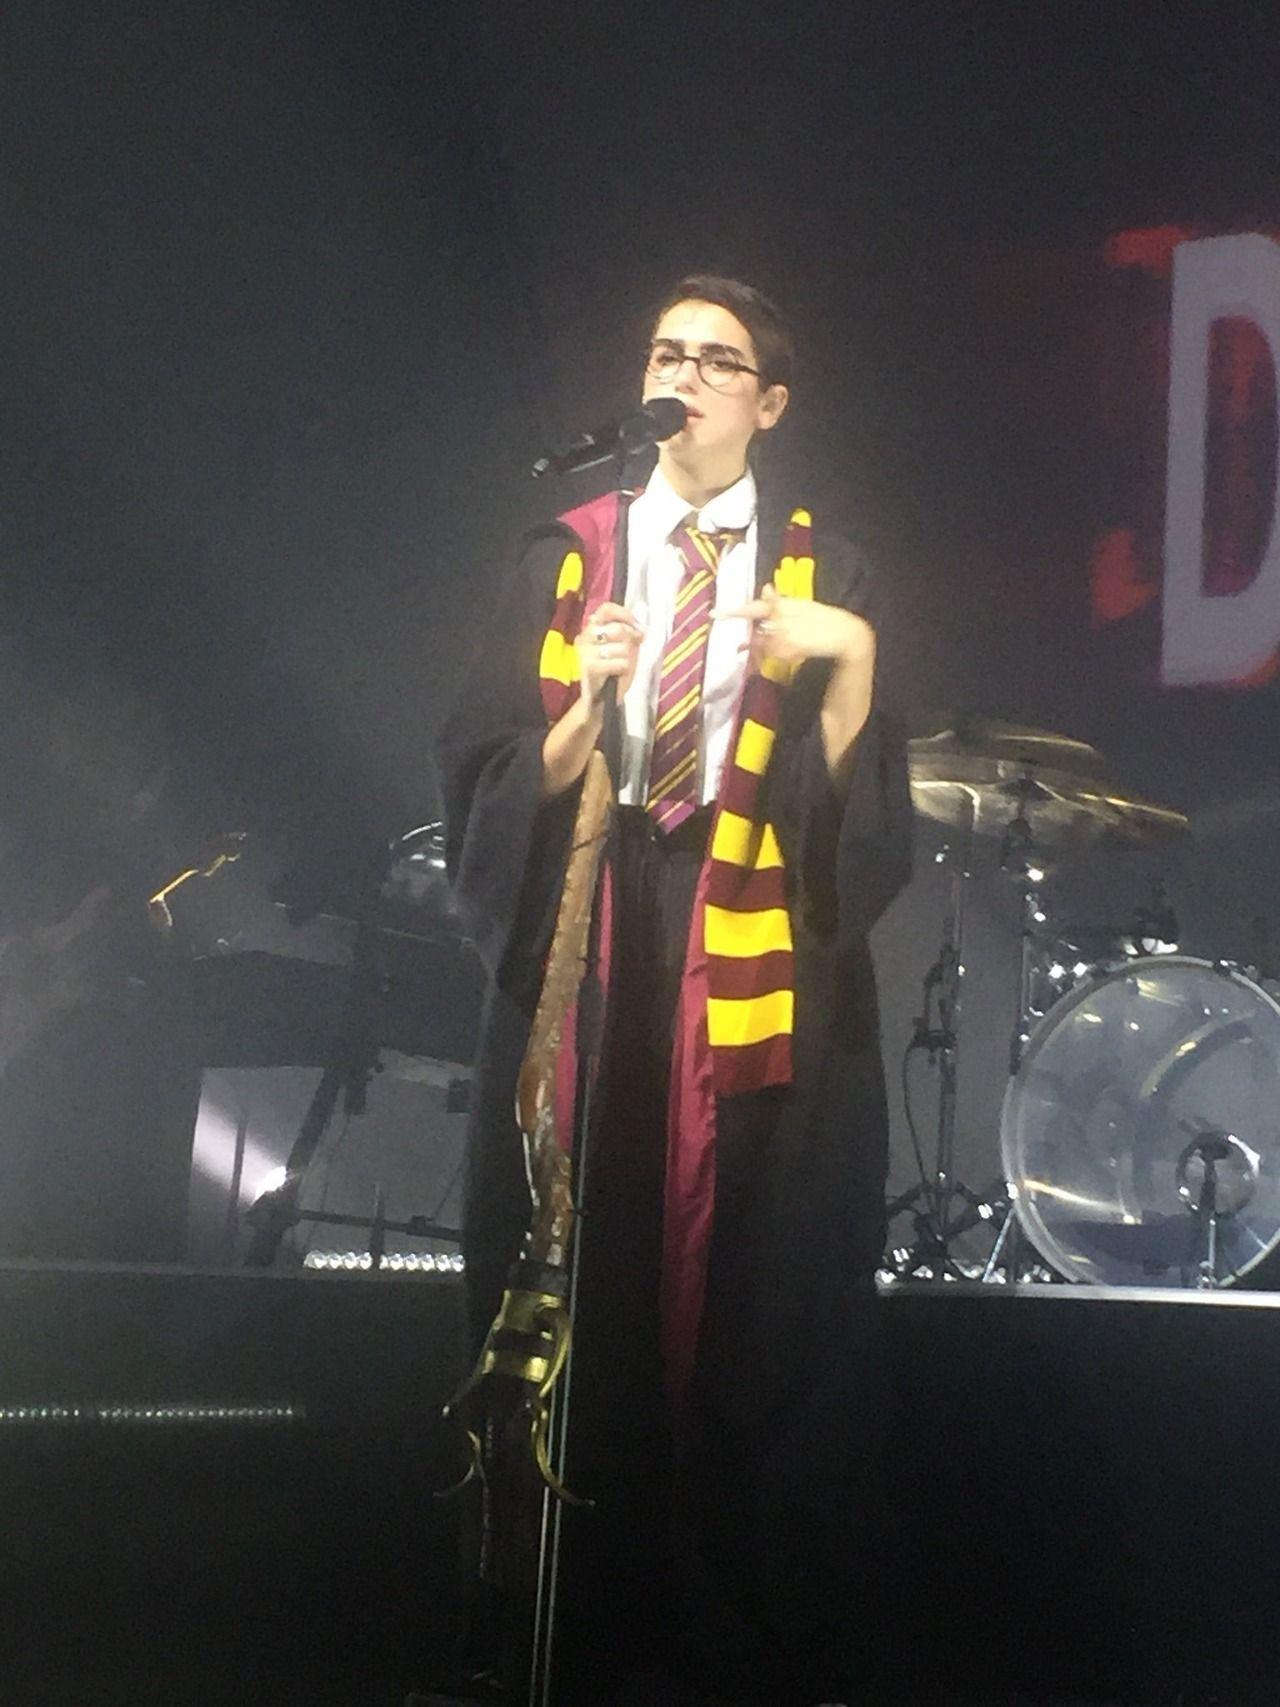 Dua Lipa As Harry Potter At Her Show In Hamburg Germany 27 10 Dua Lipa Concert Dua Lipa